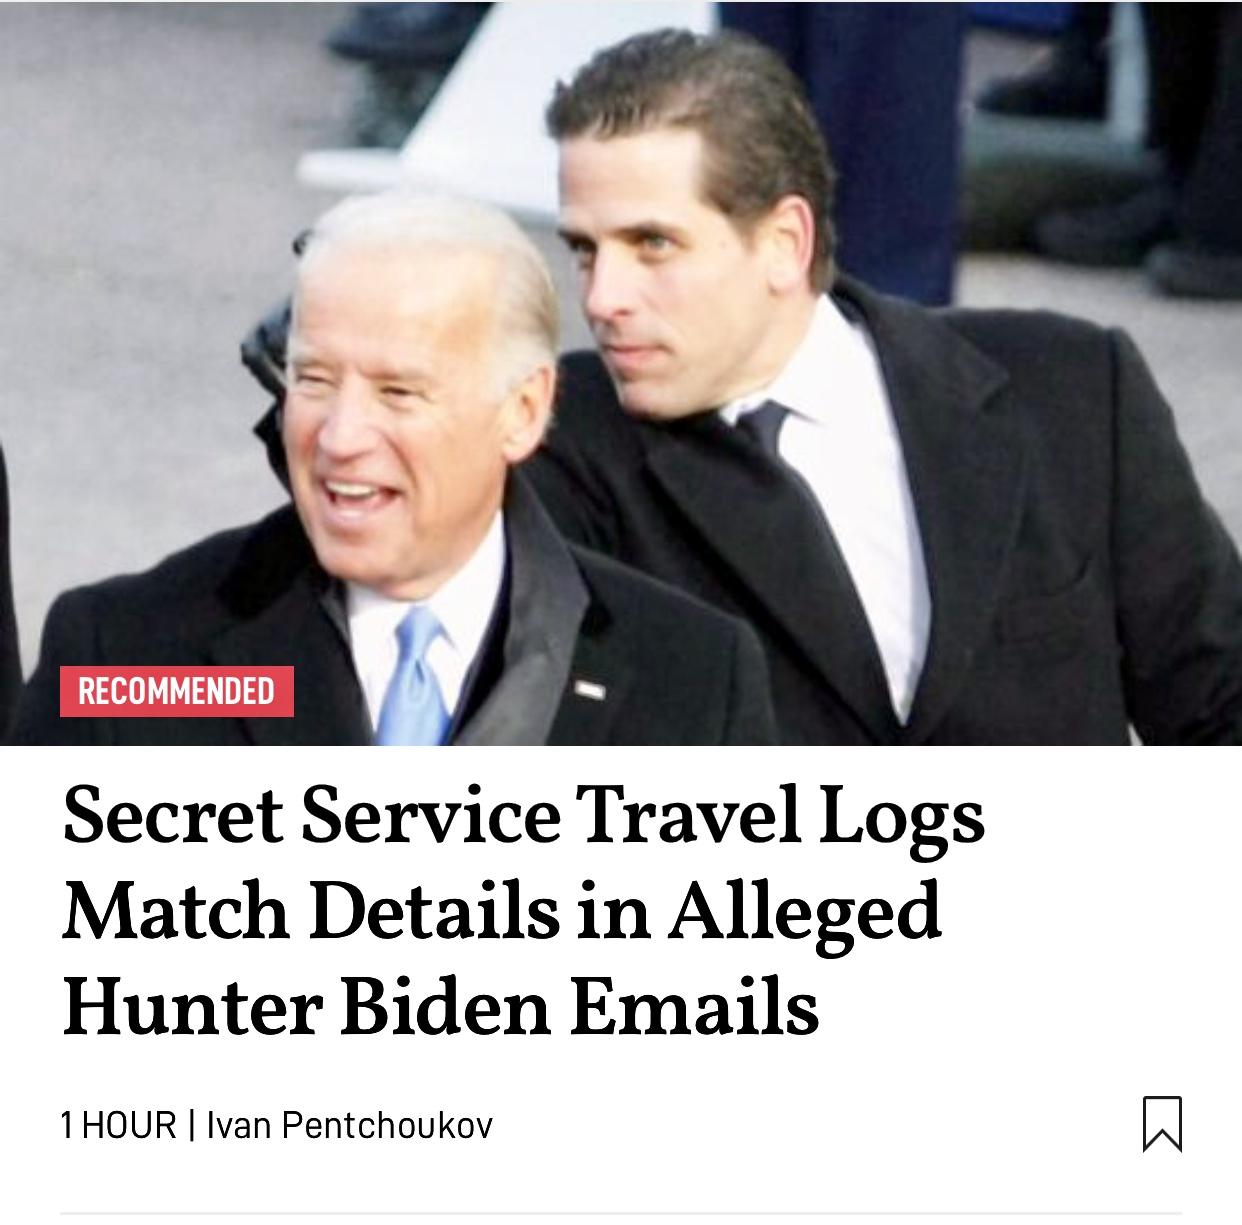 Secret Service Travel Logs Match Details in Alleged Hunter Biden Emails